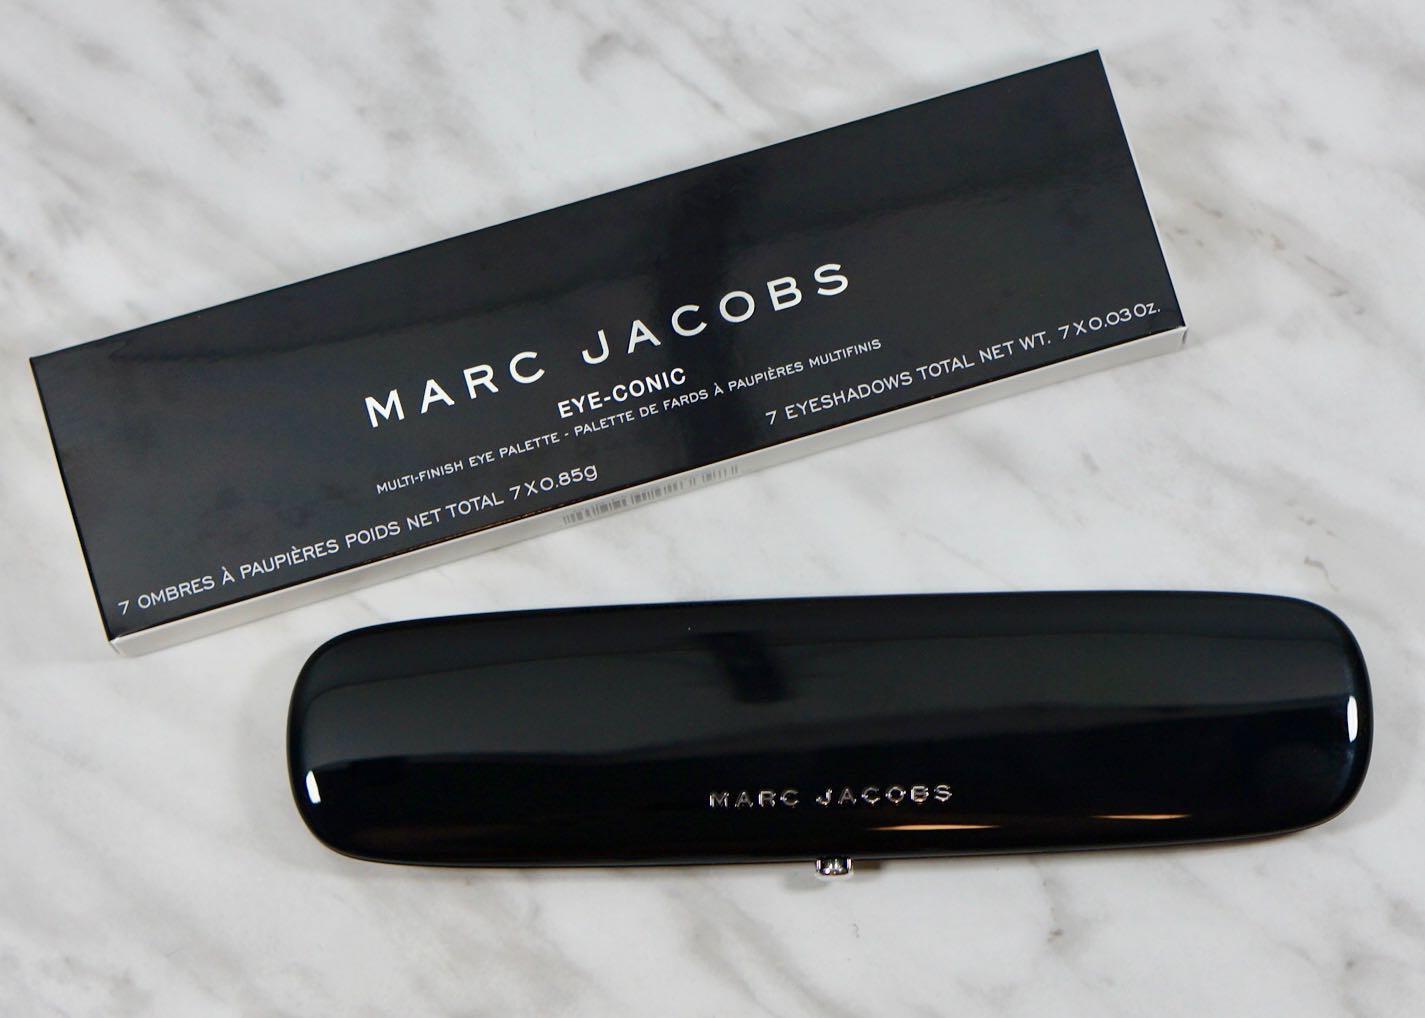 Marc Jacobs Eye-Conic Palette-720 GlambitionDSC04972.jpg